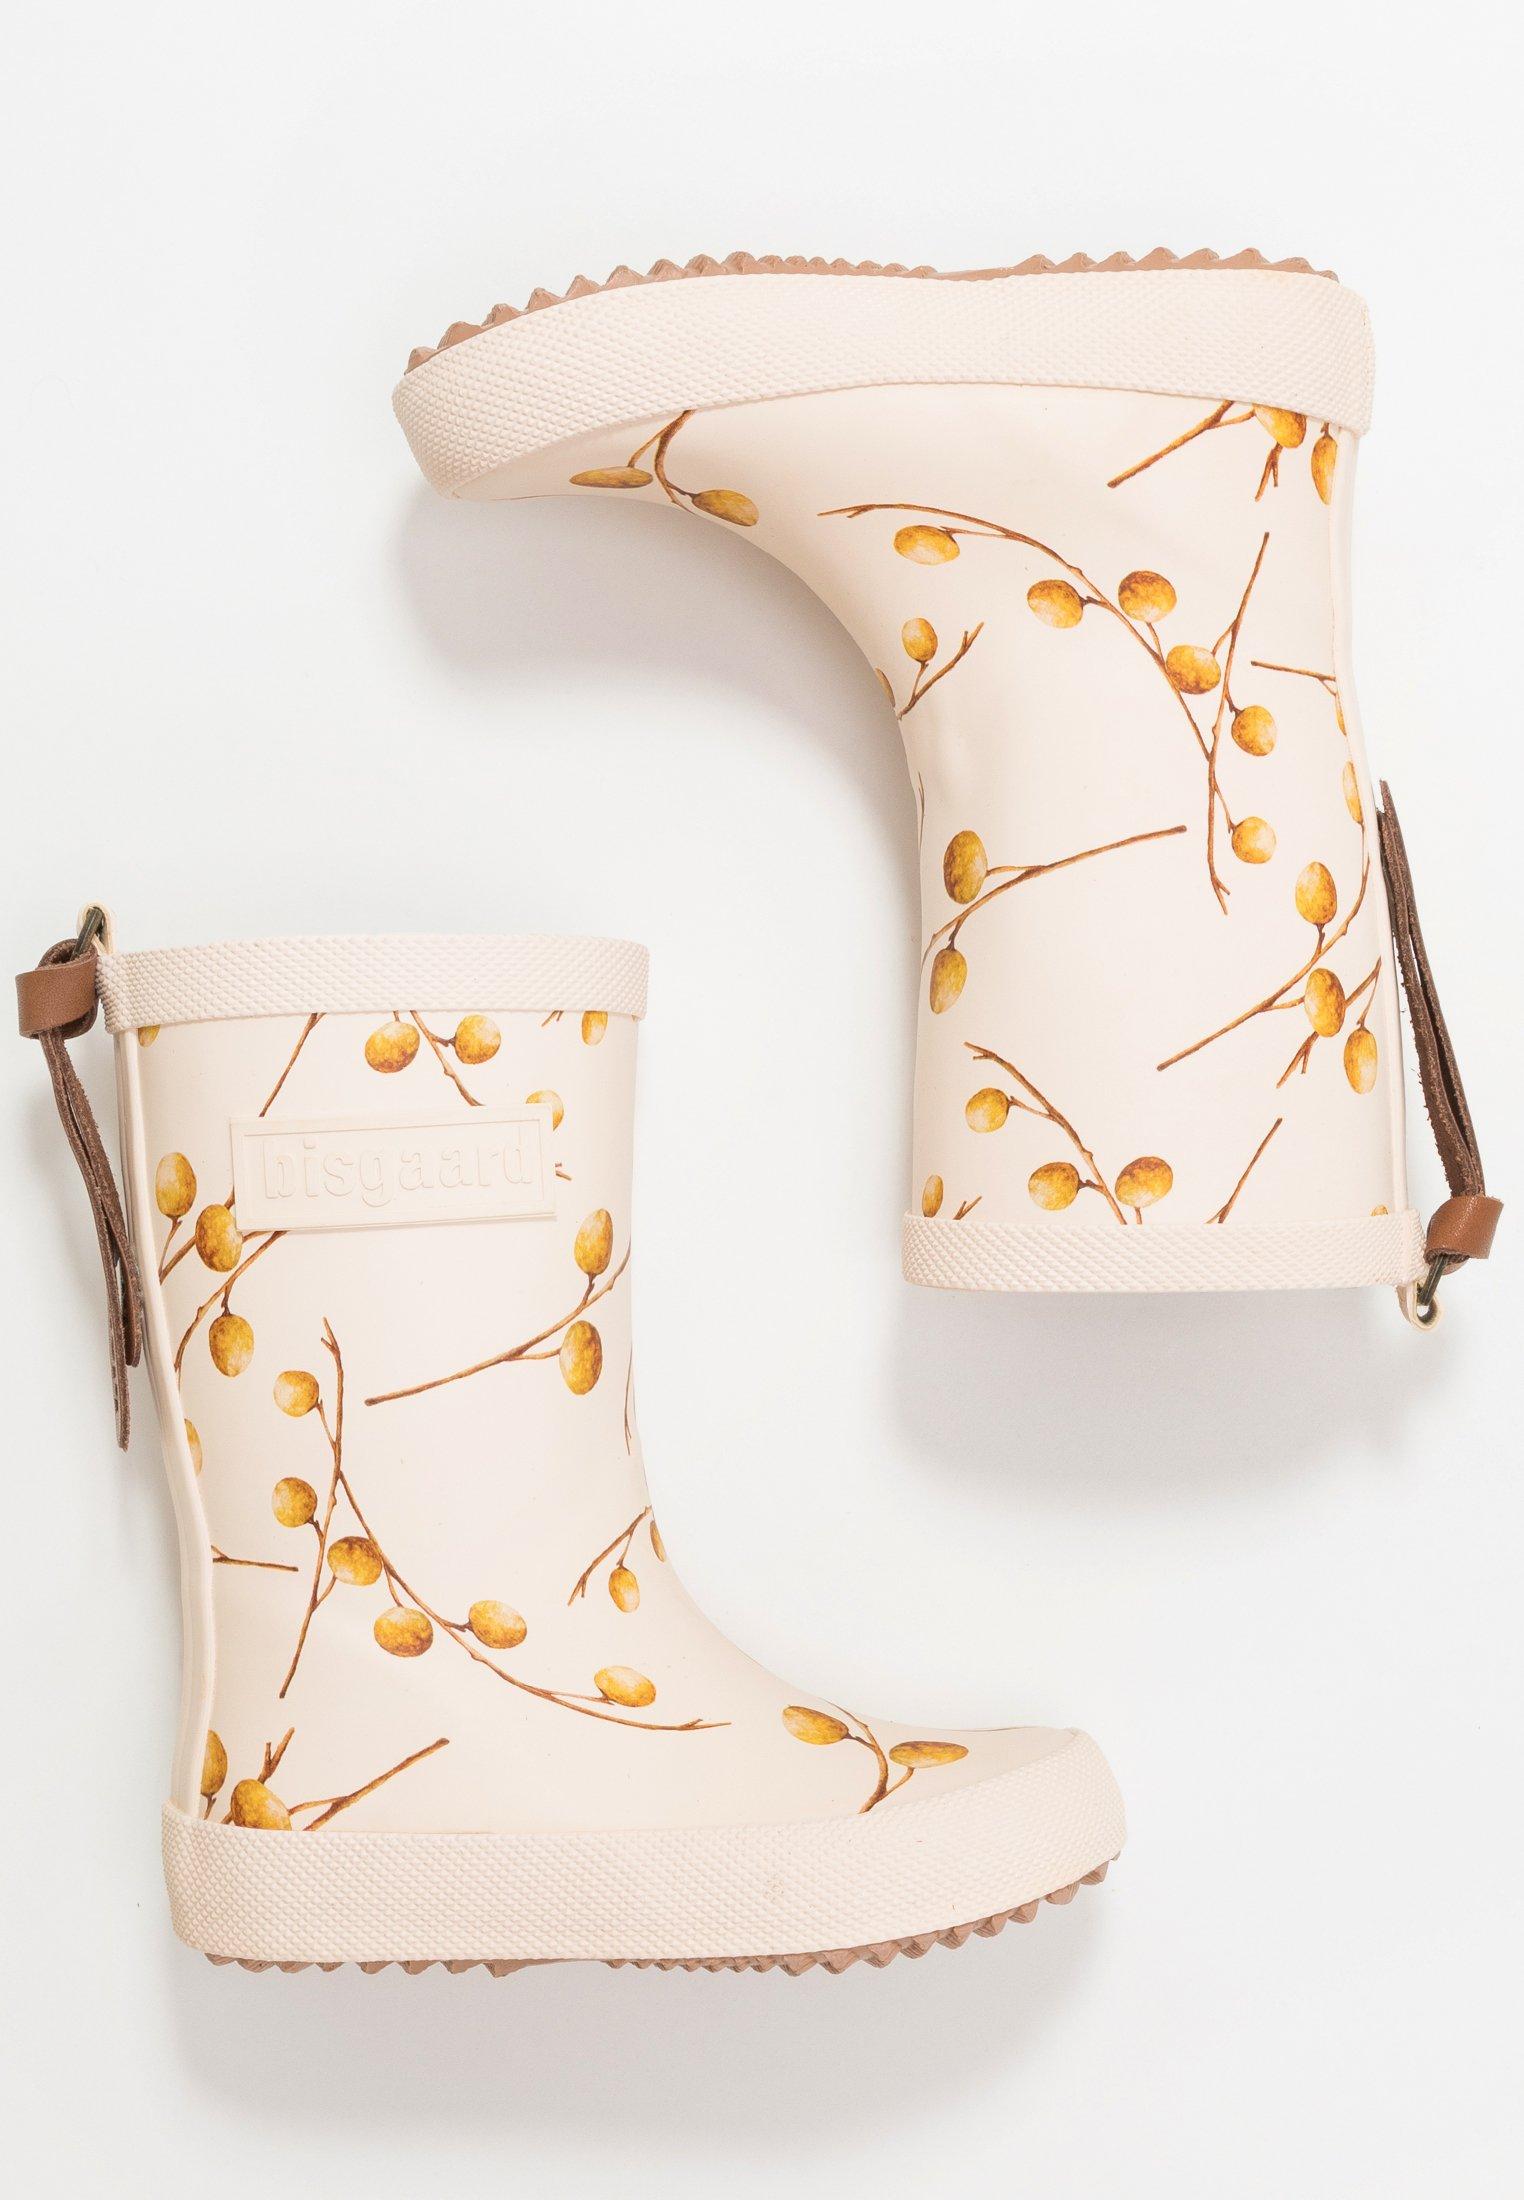 Kids fashion boot - Wellies